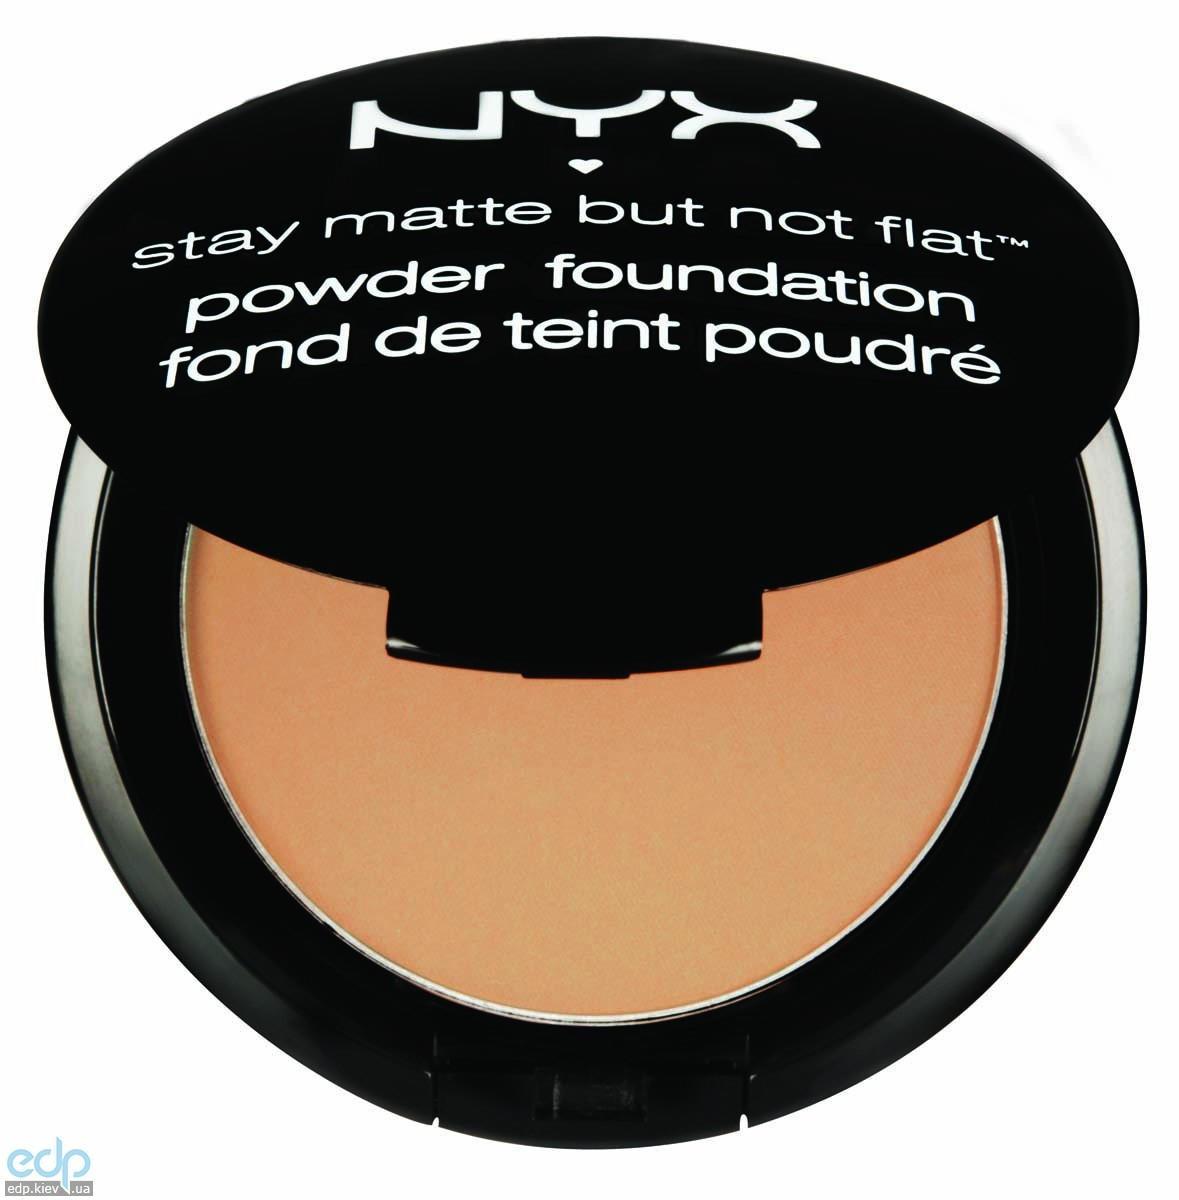 NYX - Матирующая пудра Stay Matte But Not Flat Medium Beige SMP06 - 7.5 g